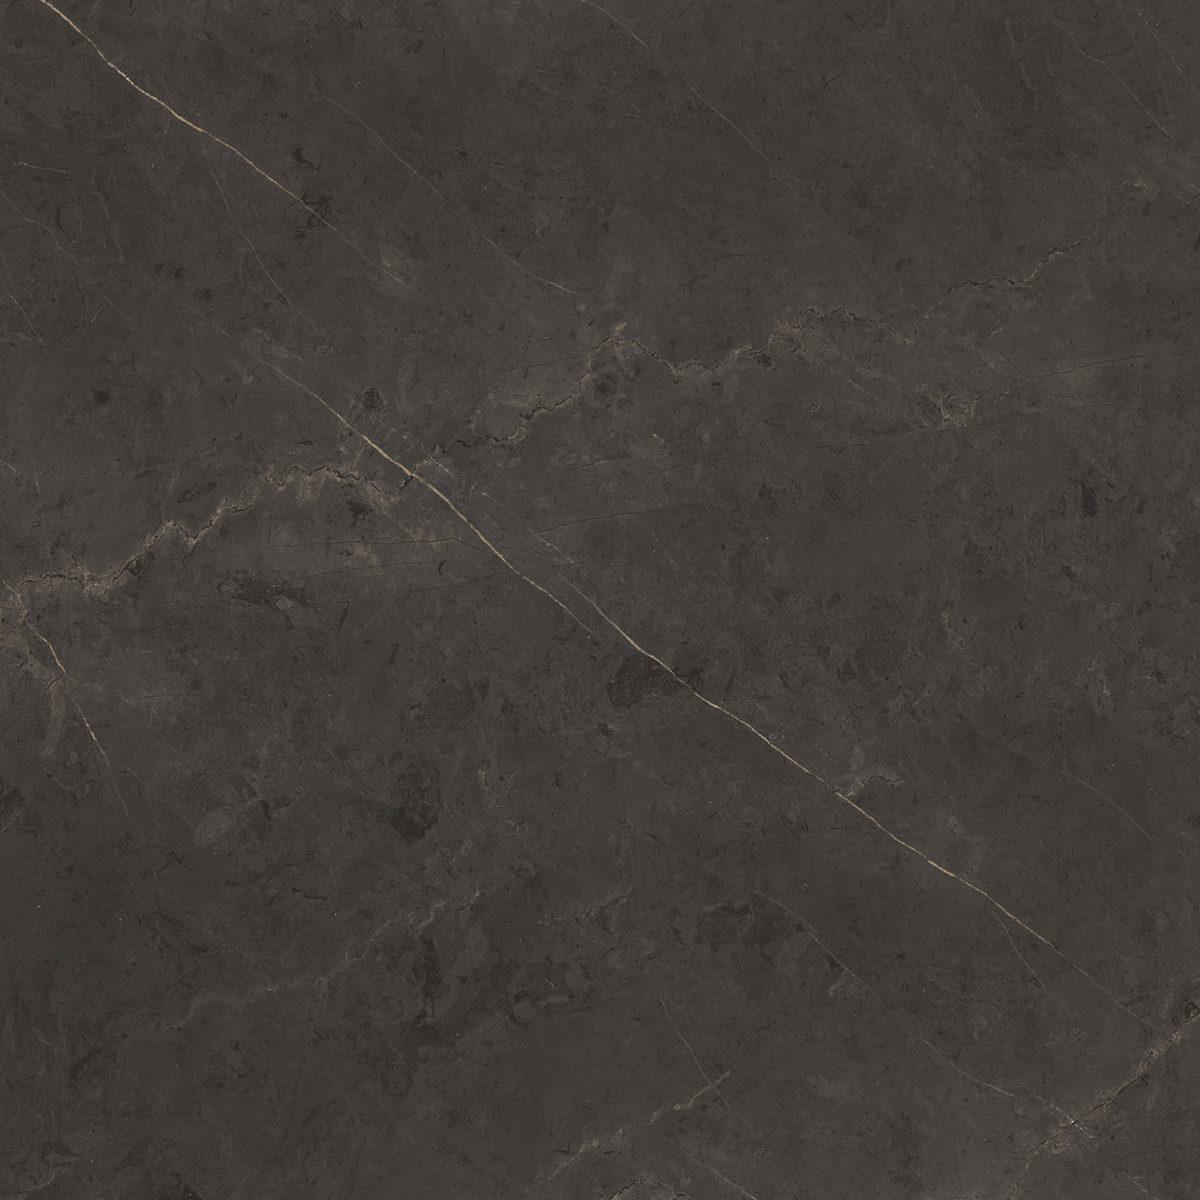 Porcelanosa Karachi Grey Anti-Slip Tile 120 x 120 cm